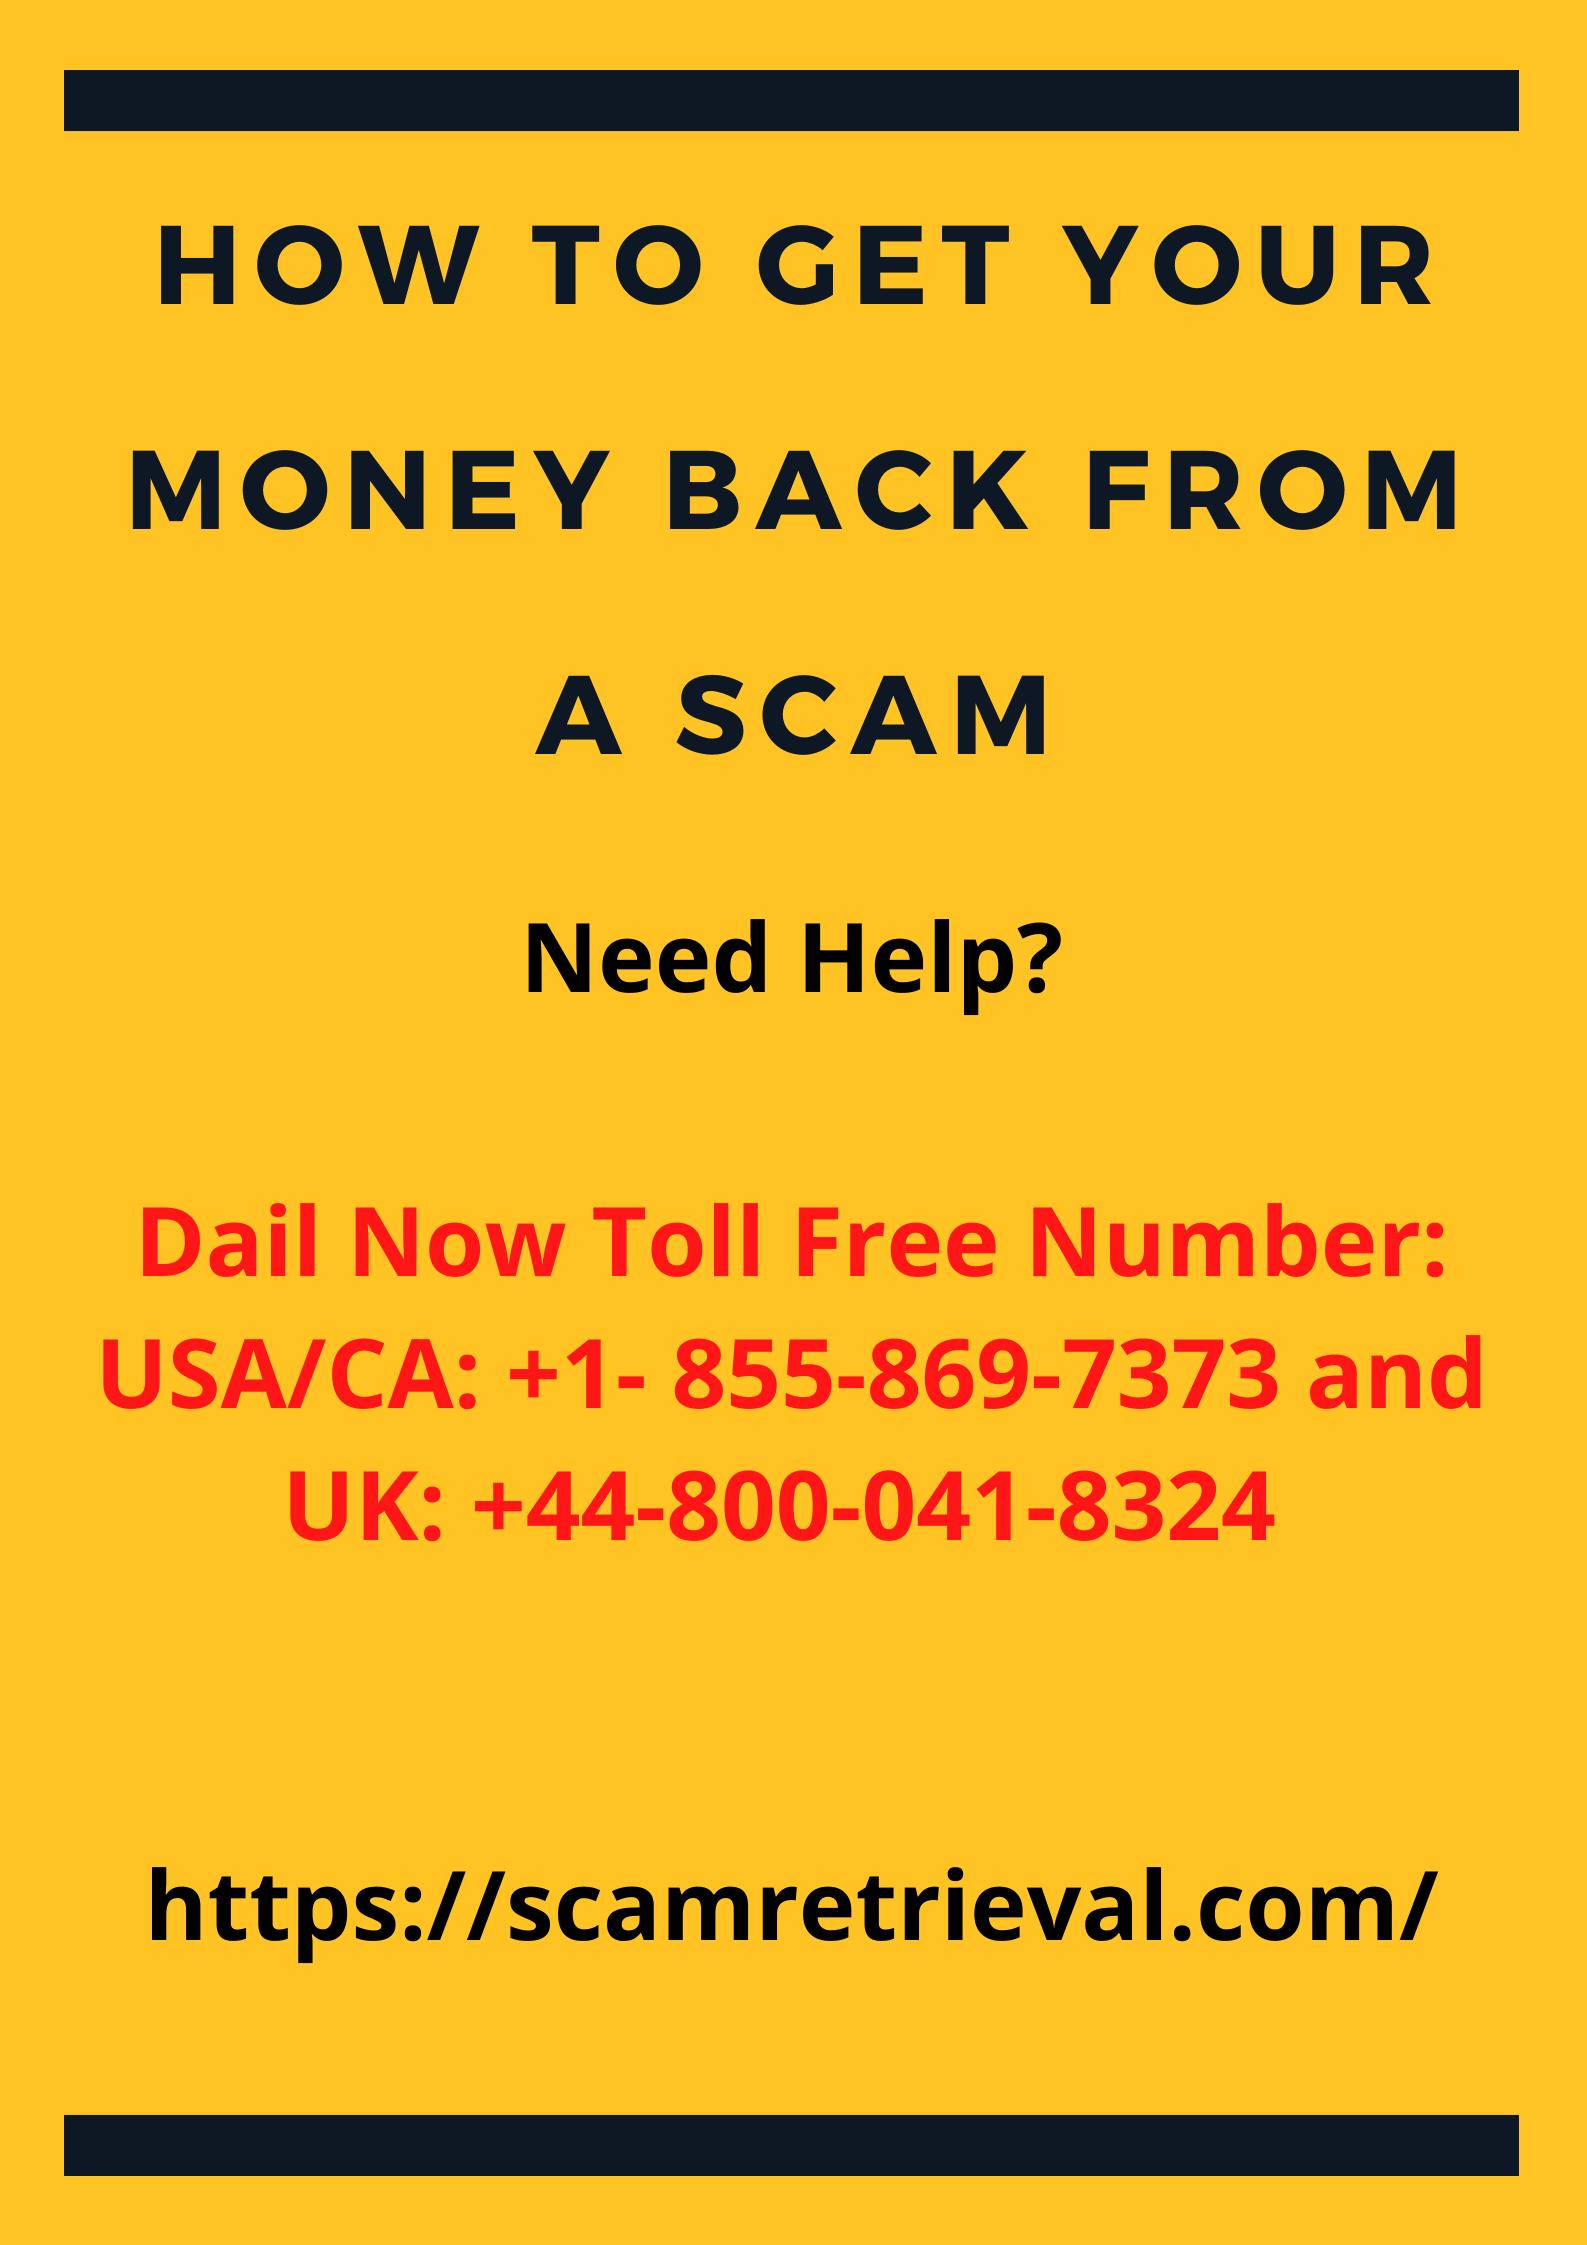 b4aee0d0edcba171bff19c89716bc6d1 - How To Get Money Back After Being Scammed Online Uk